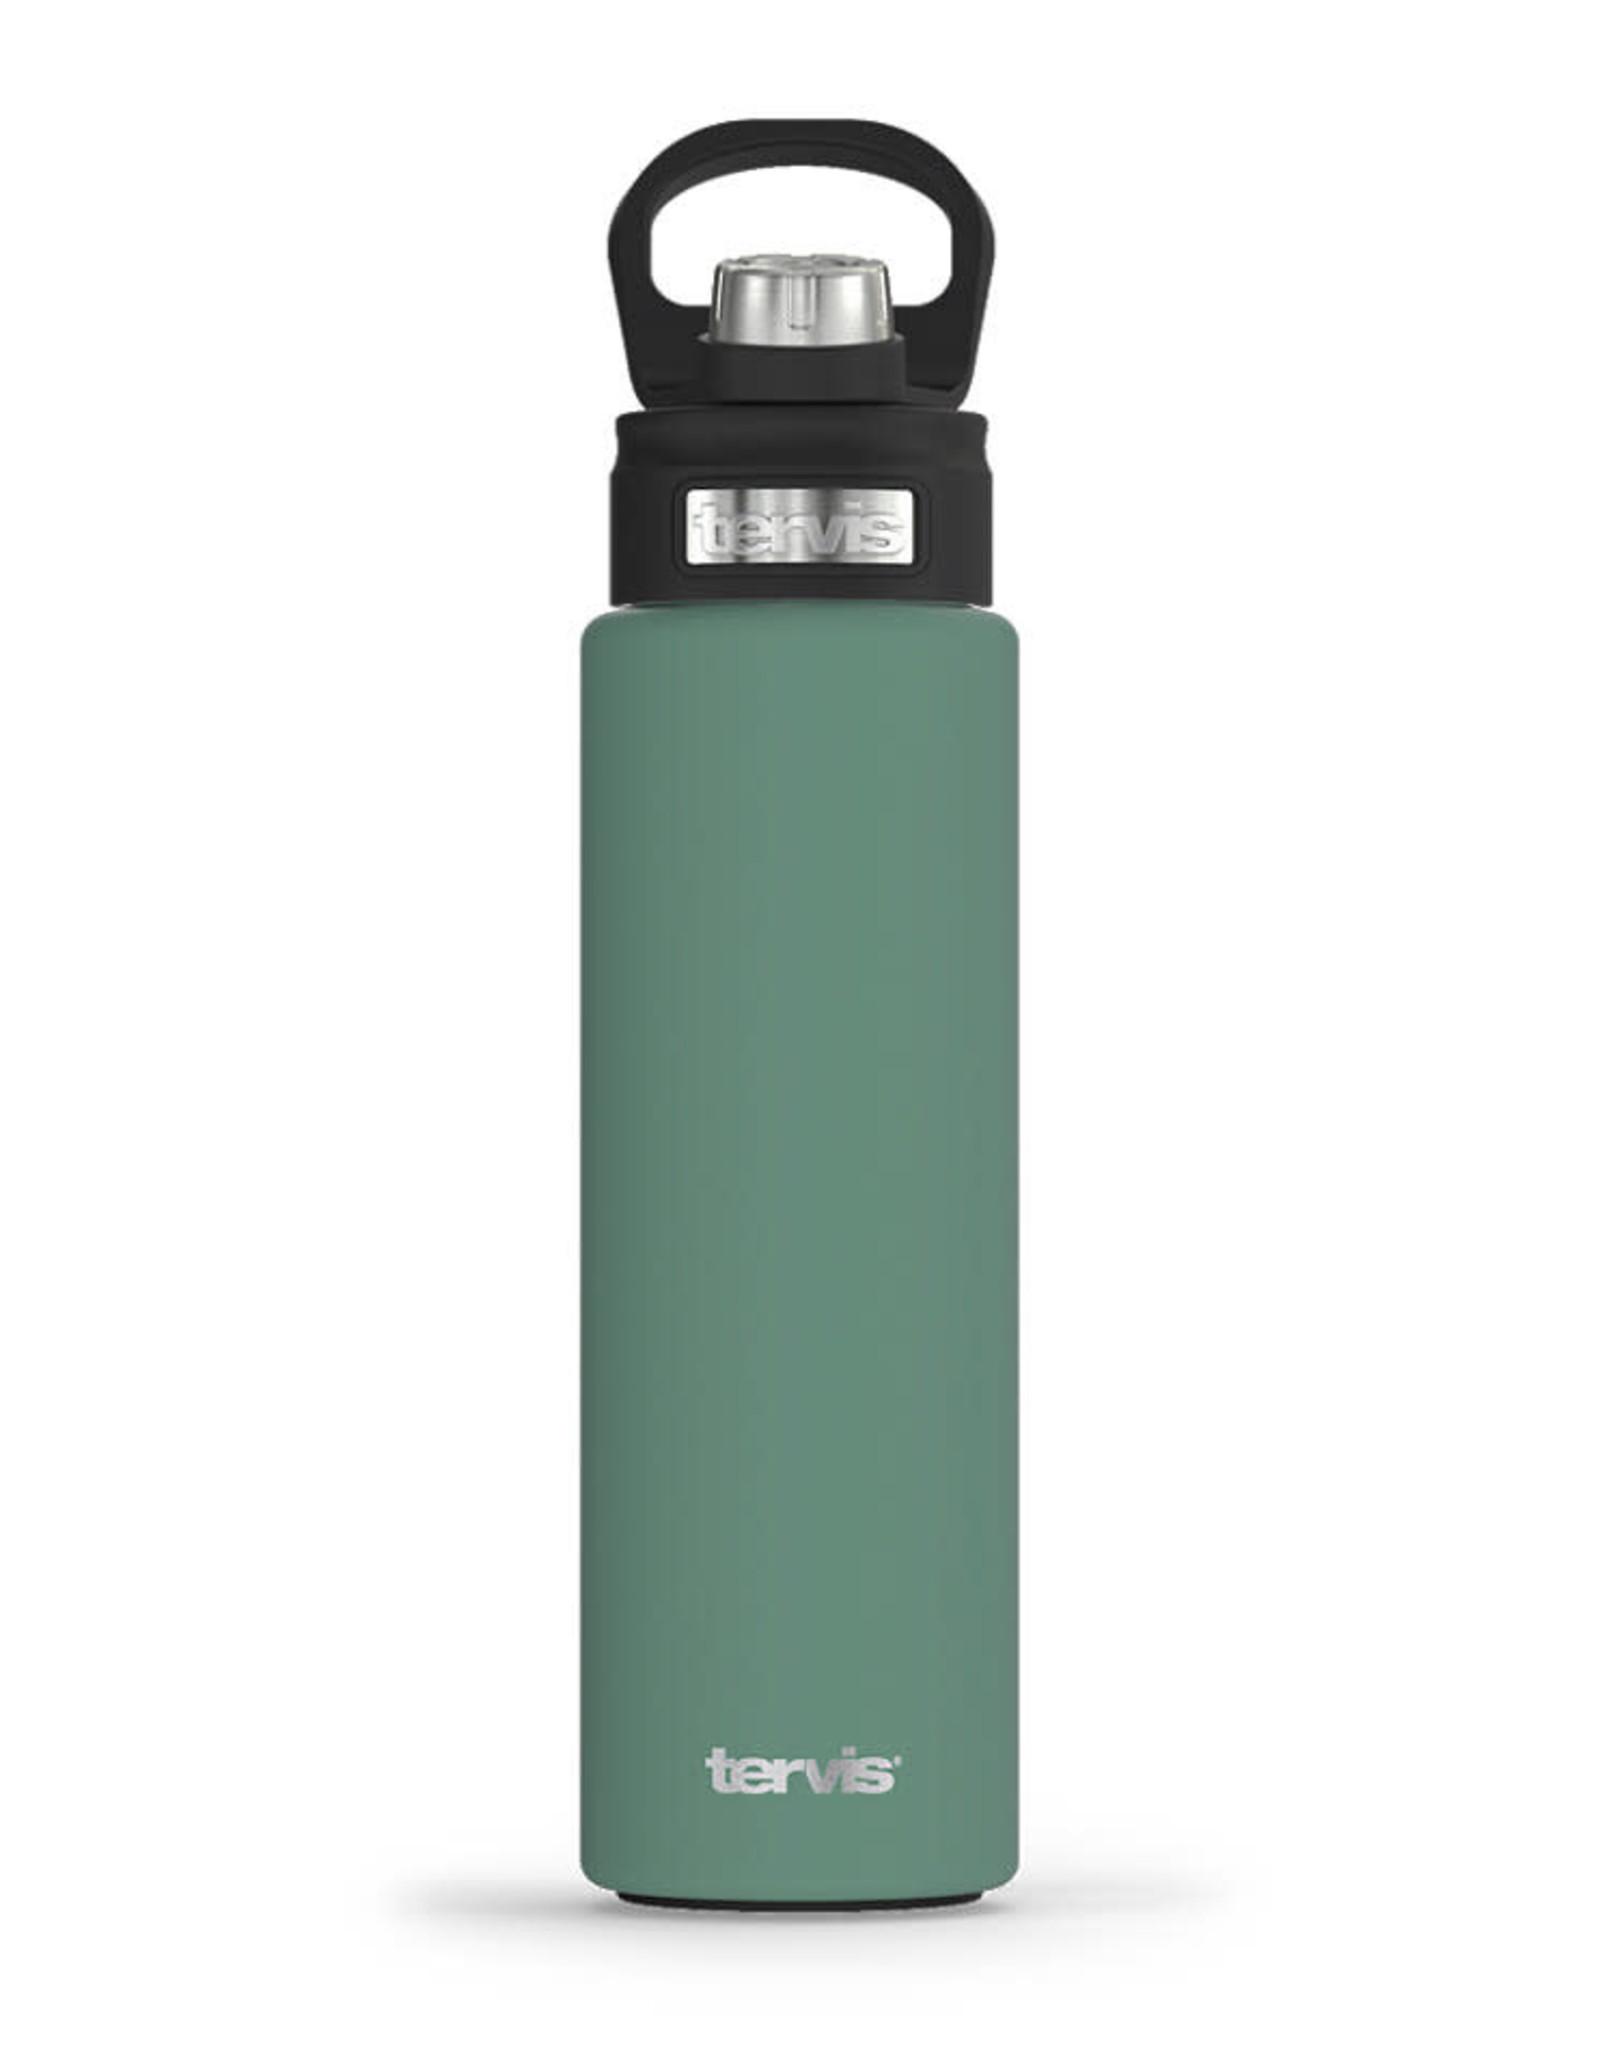 Tervis Tumbler 24oz Stainless Water Bottle Aloe Green Powder Coated